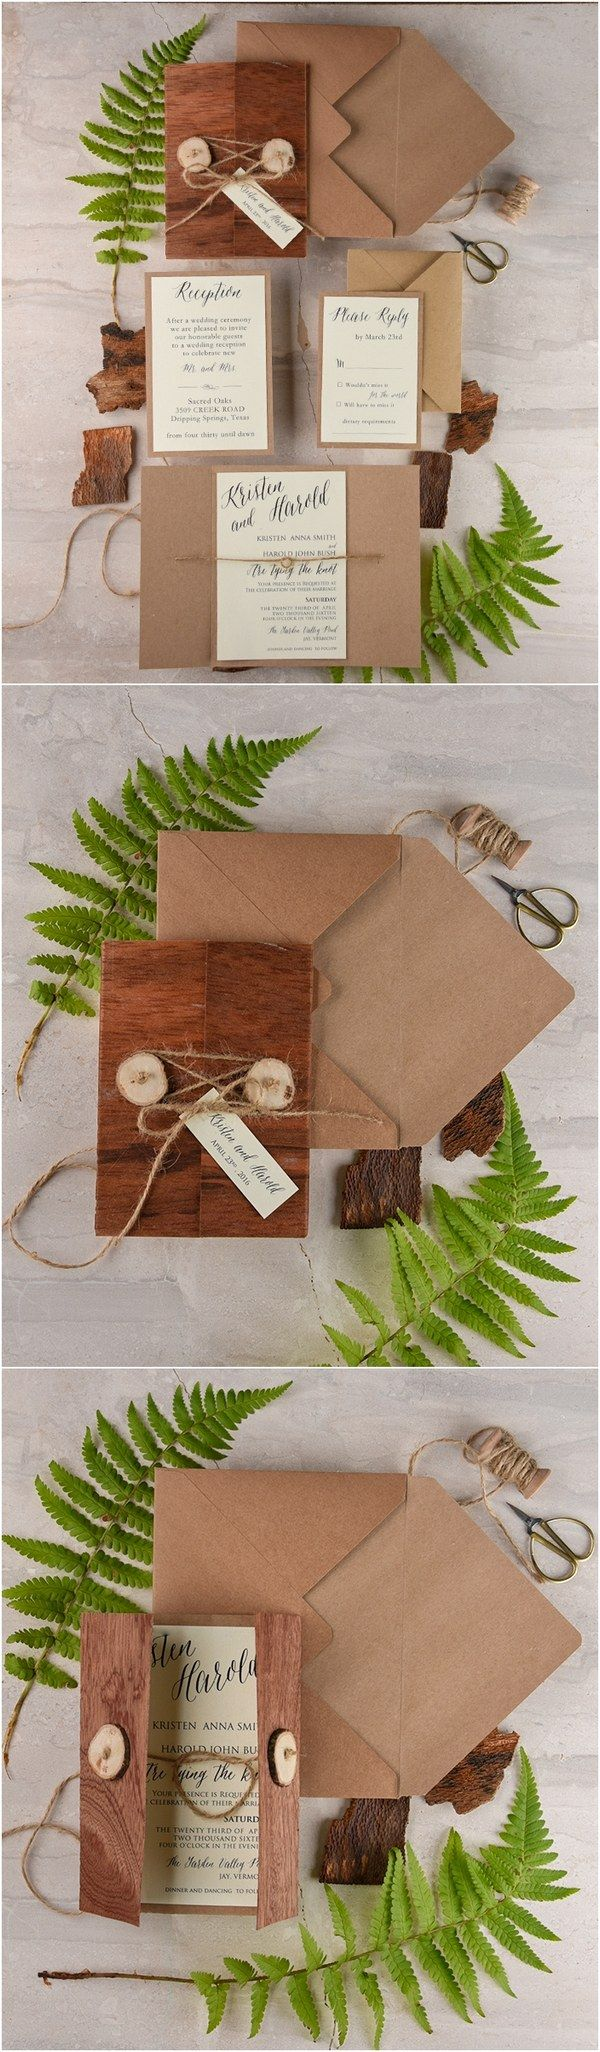 Rustic real wood wedding invitation kit @4LOVEPolkaDots